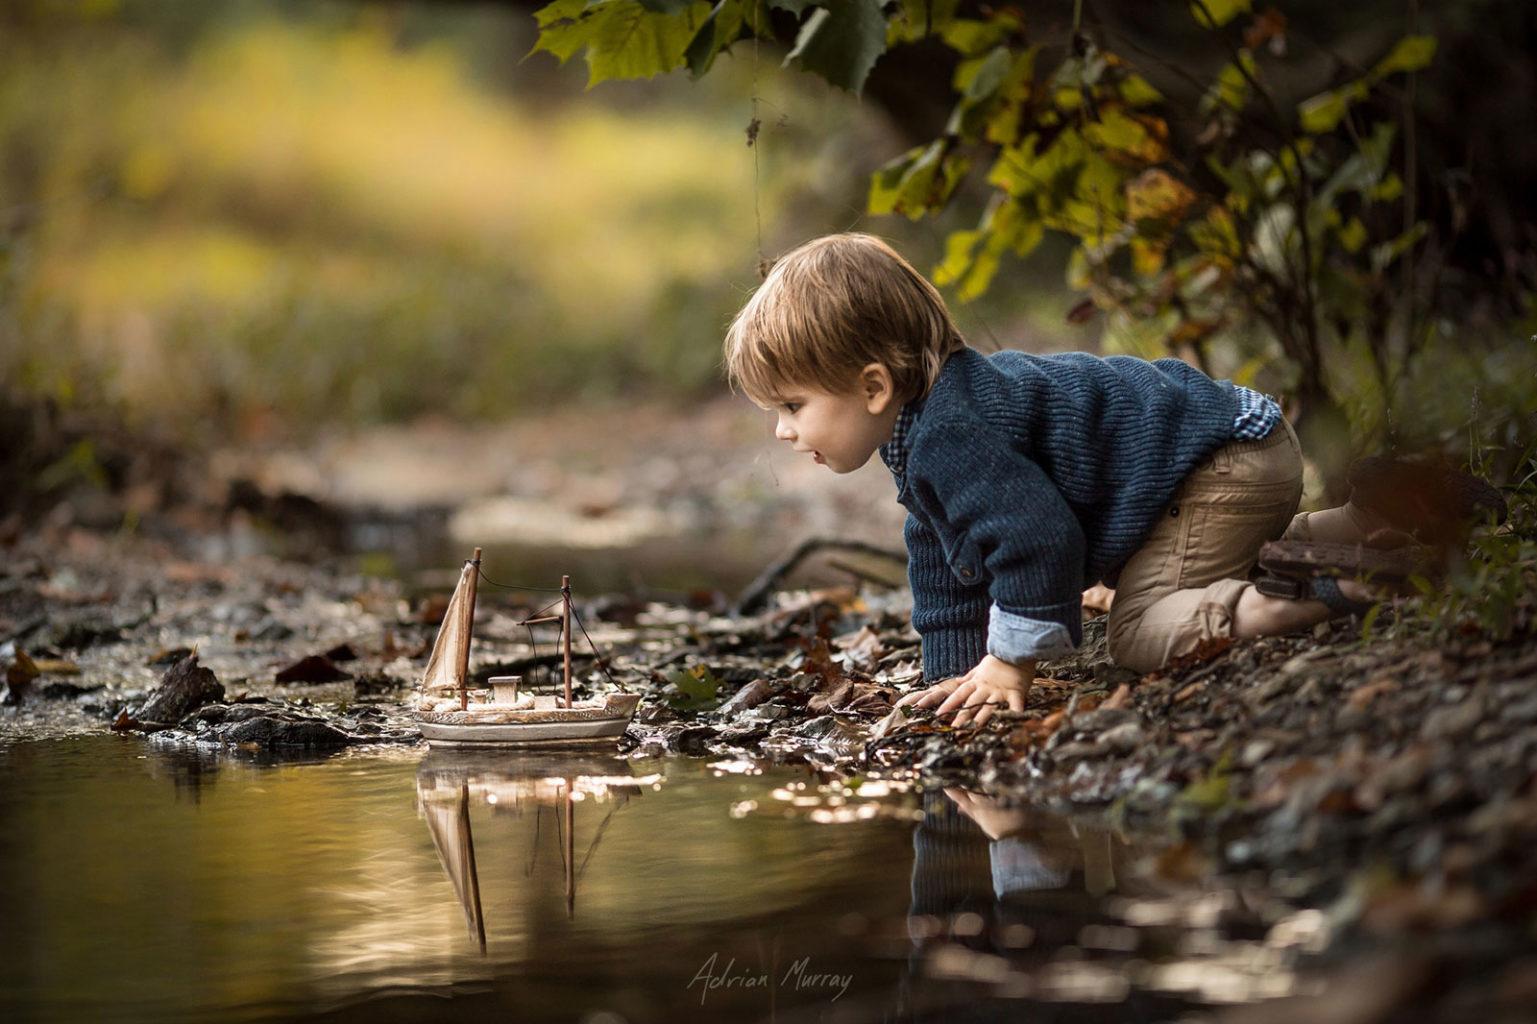 развитие ребенка происходит из точки покоя